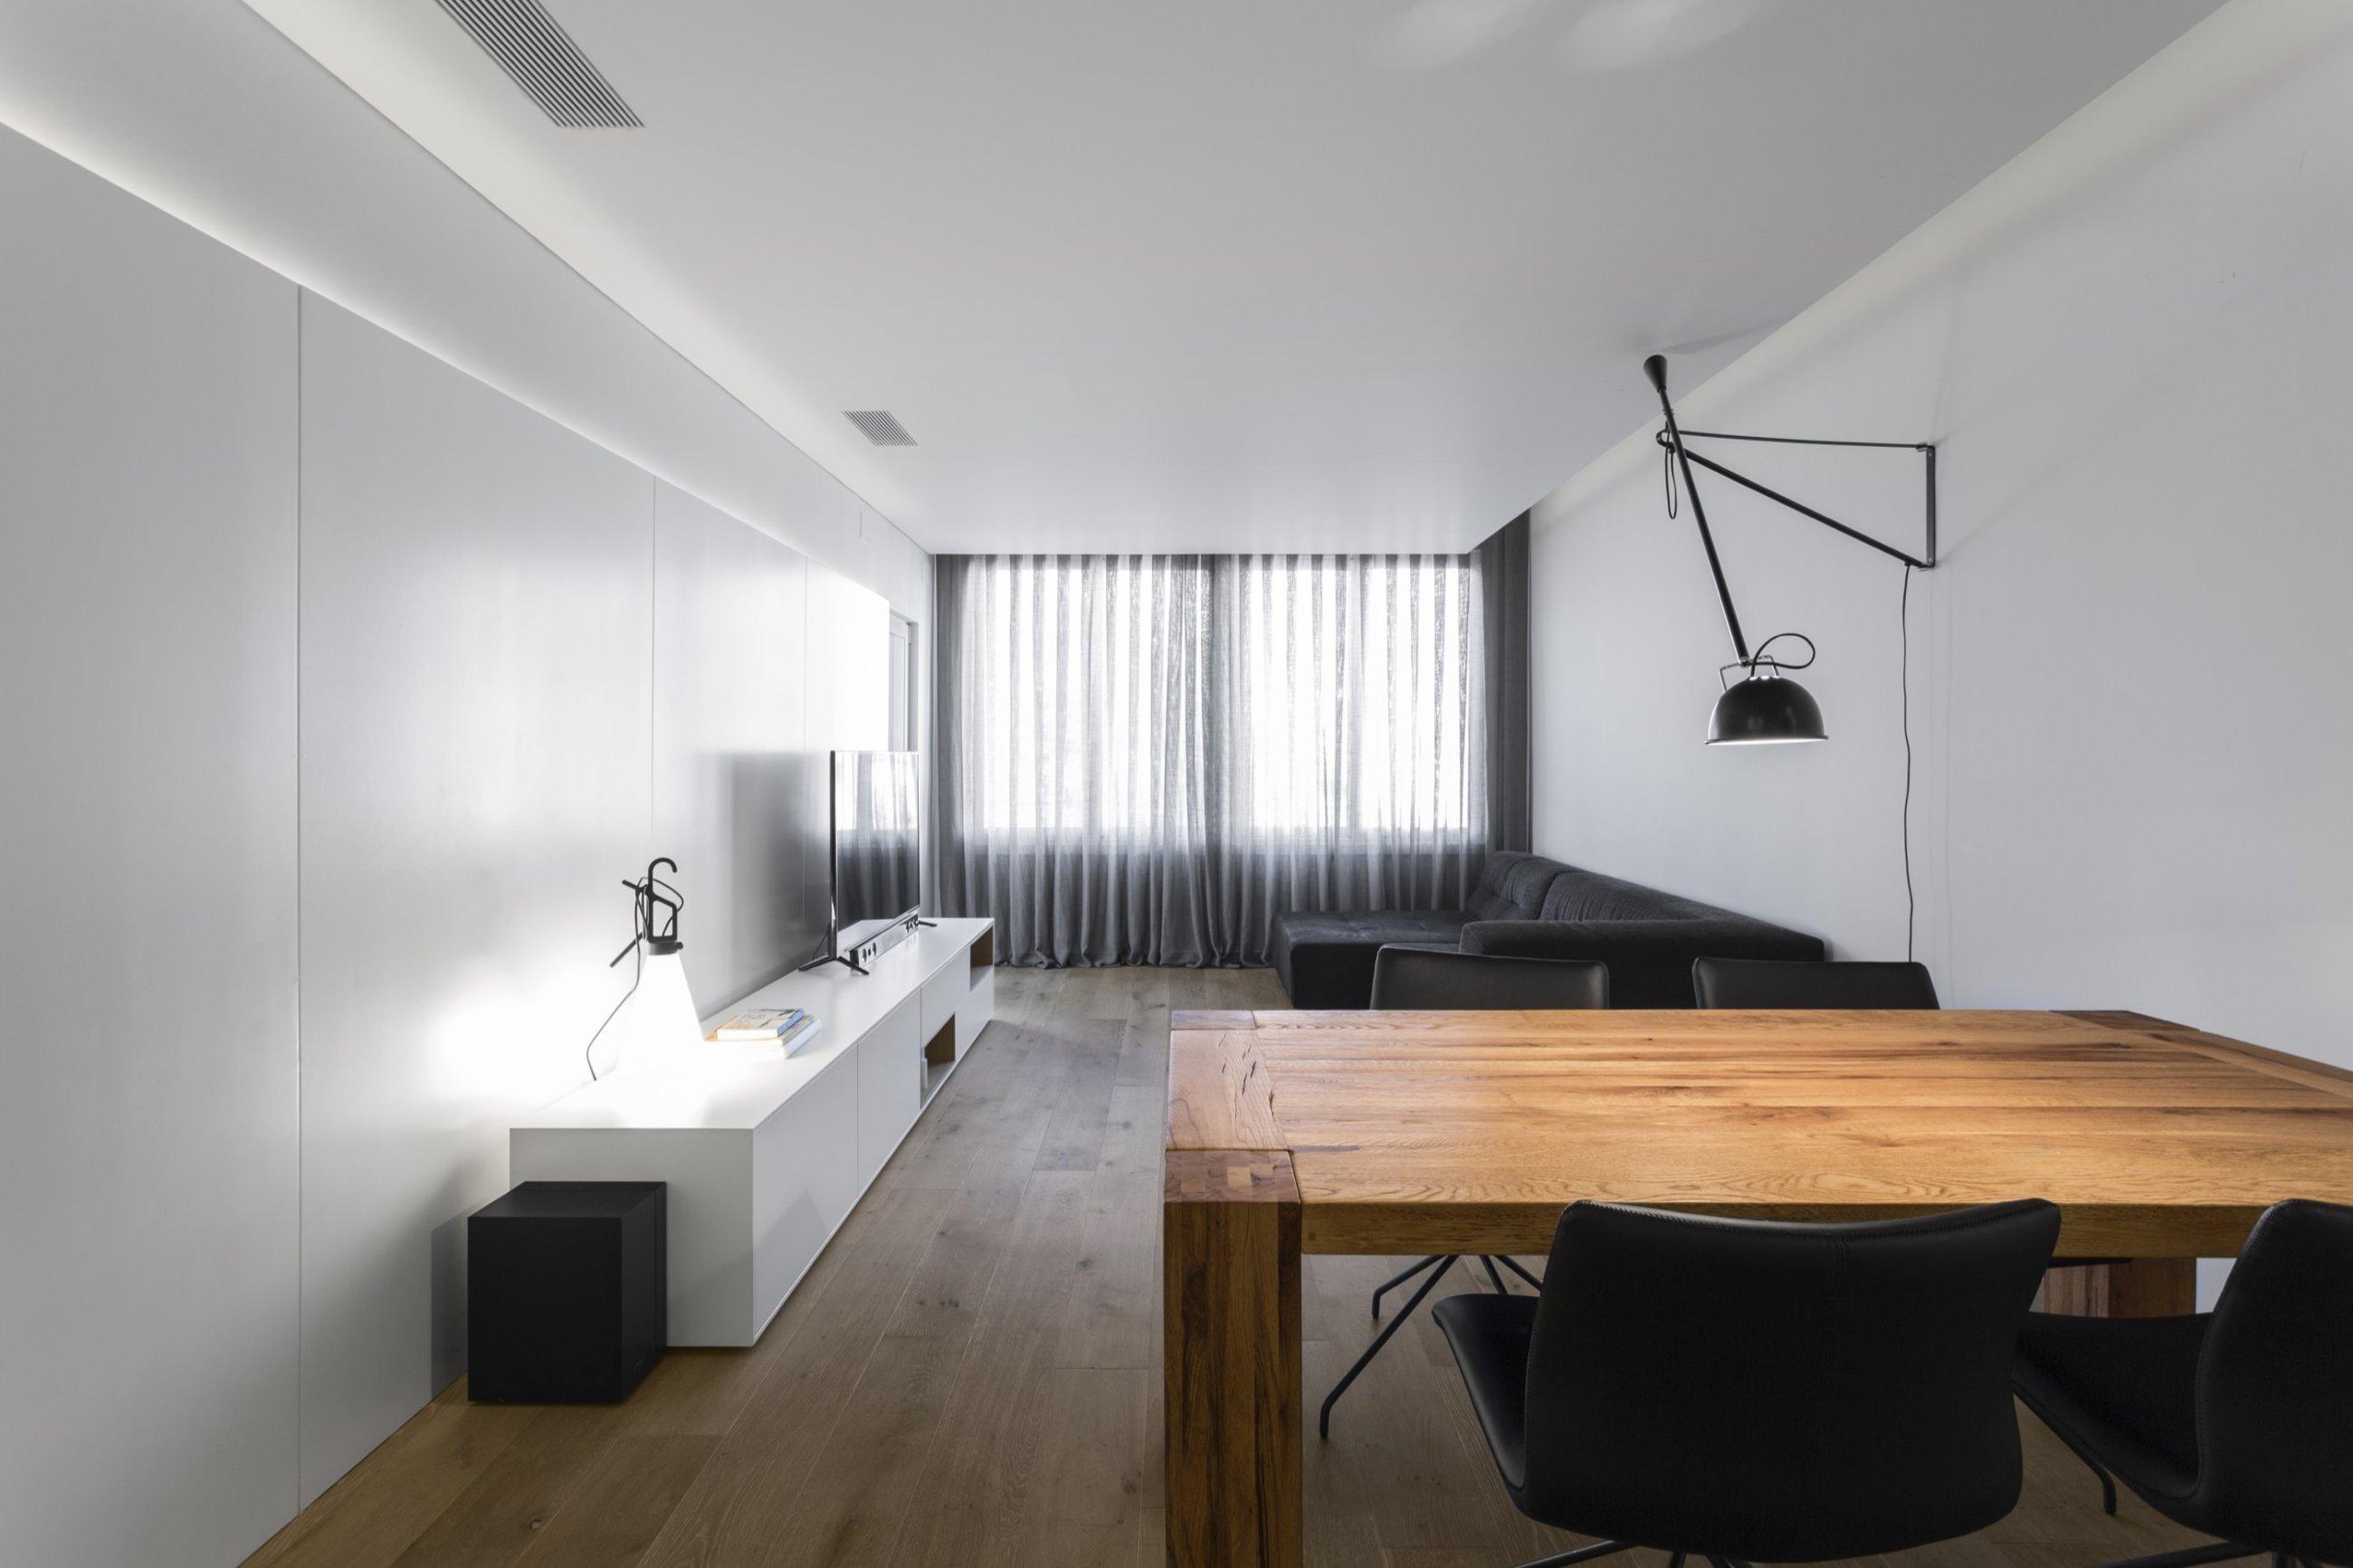 Apartamento Barcelona Arquitecto Paulo Martins 23 do fotografo Ivo Tavares Studio